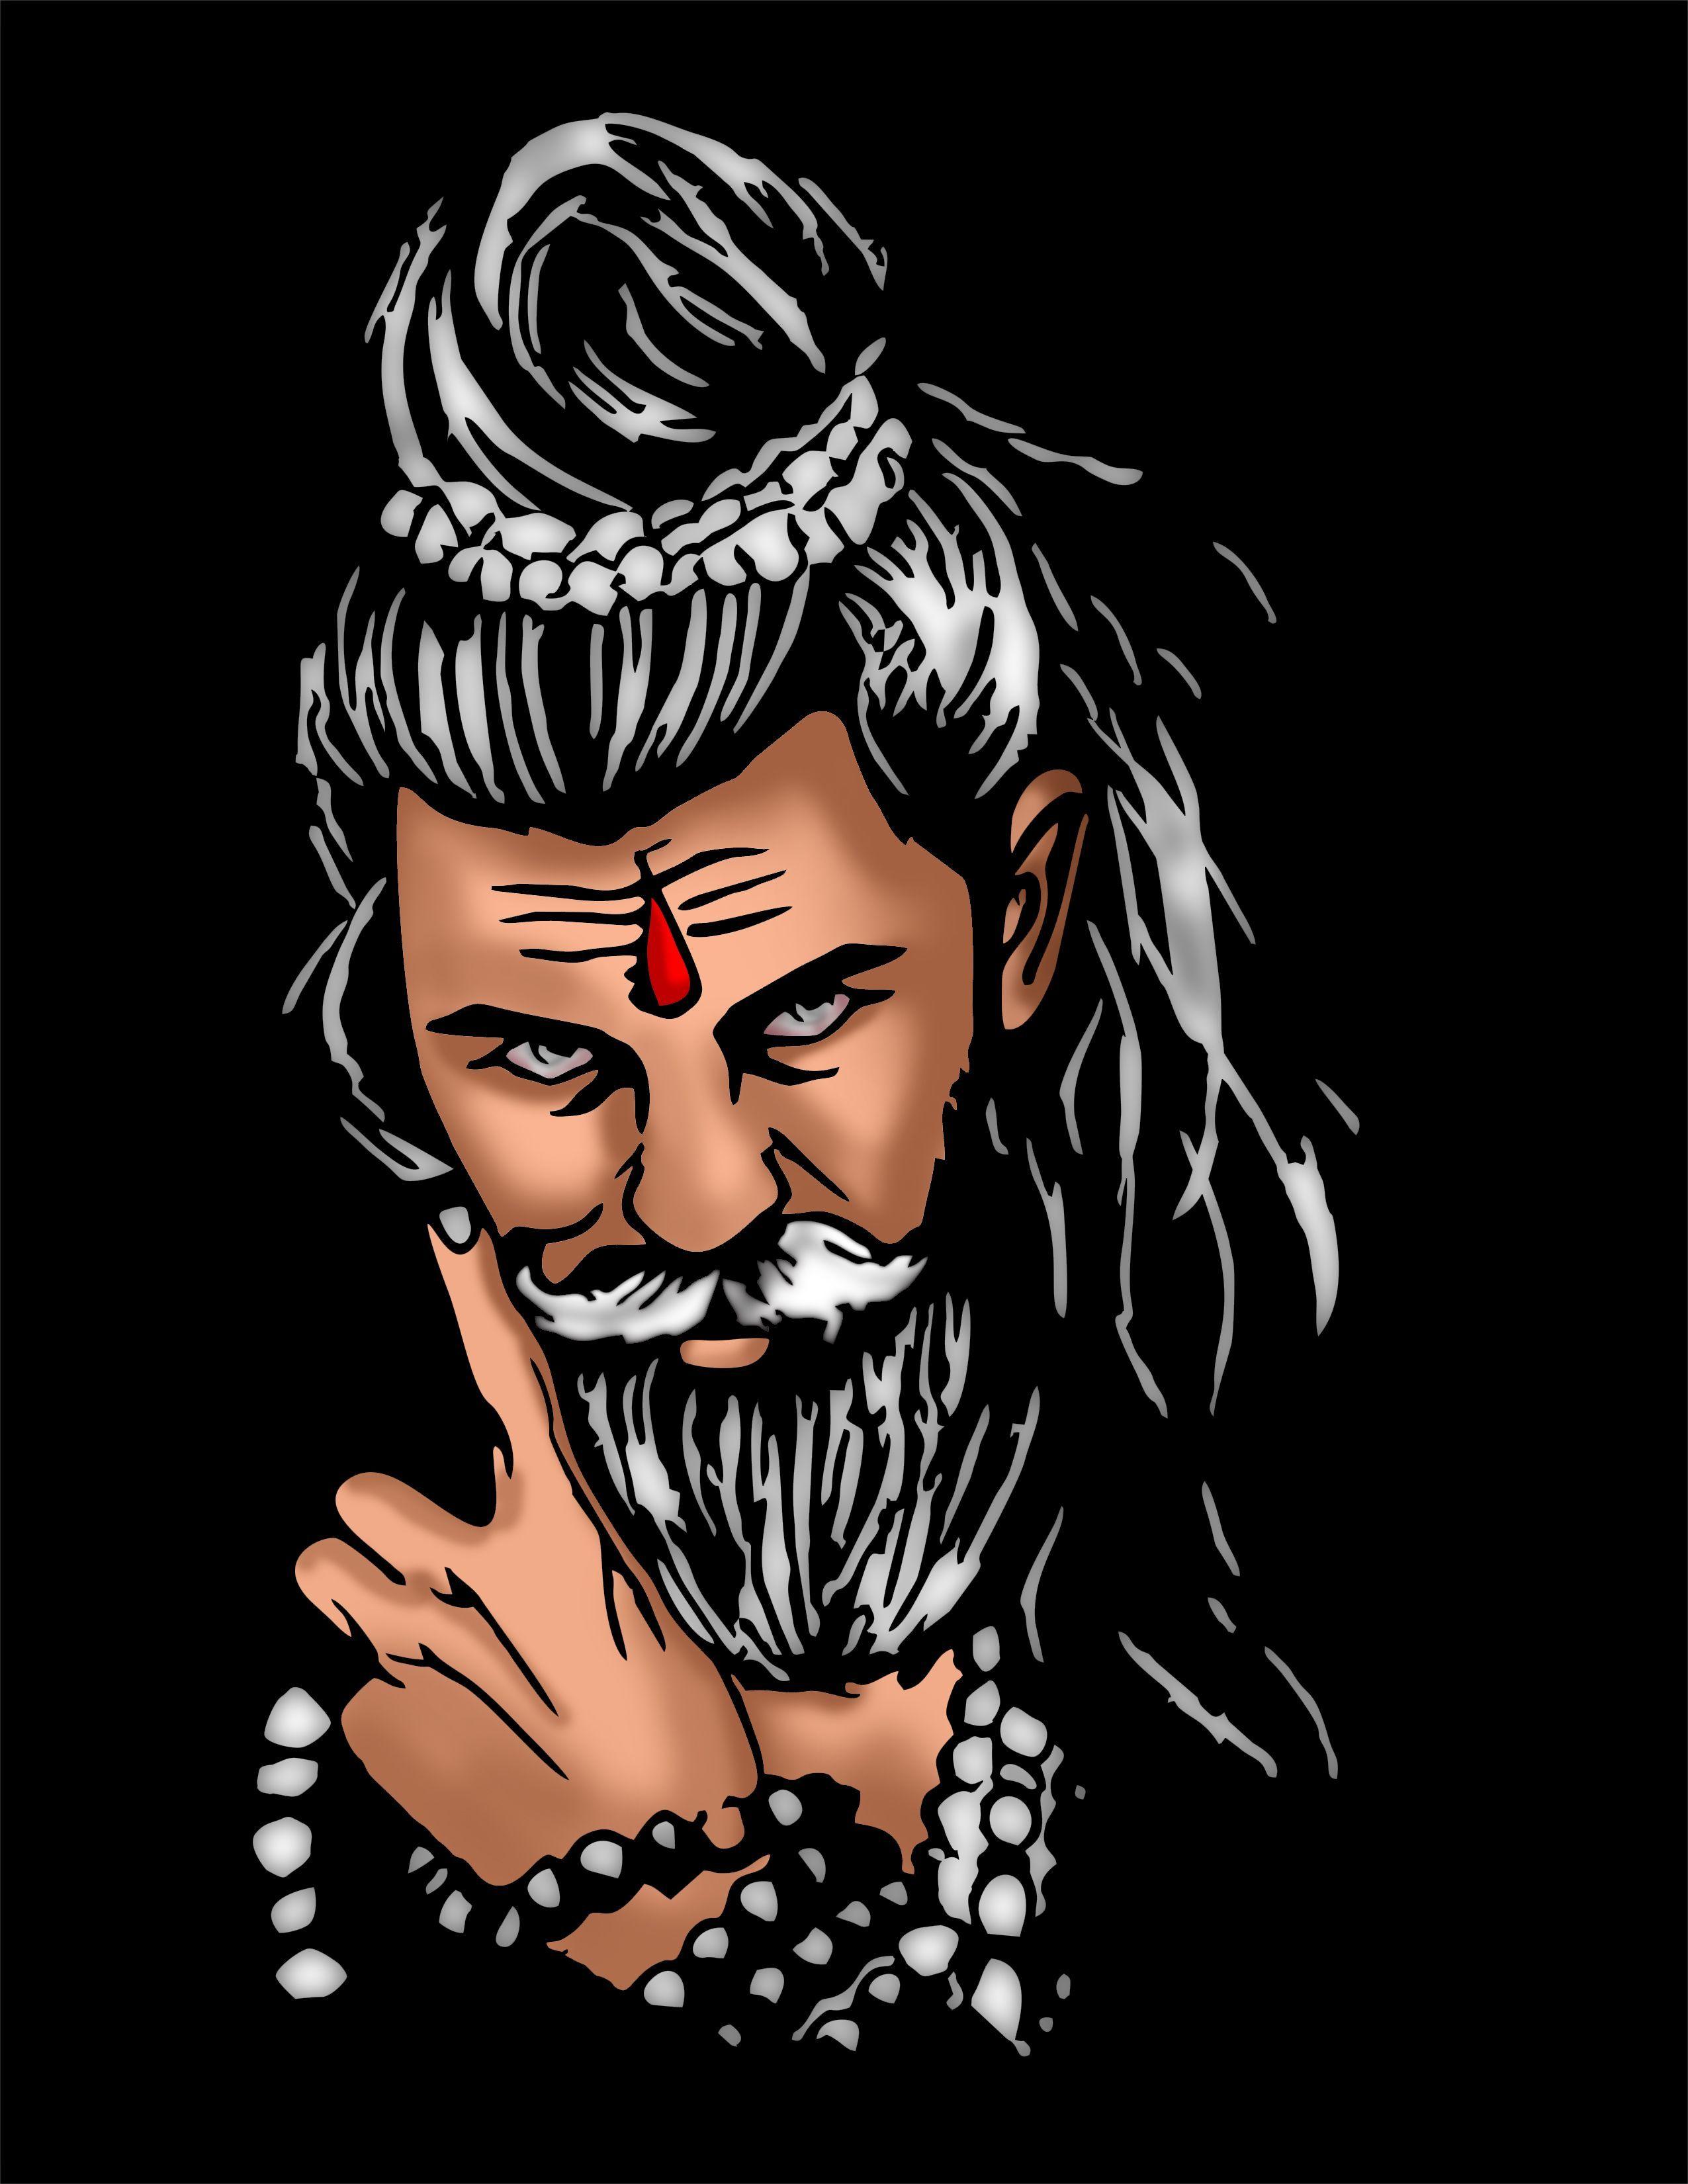 Pin By Karan Karan On Lord Shiva Hd Wallpaper Lord Shiva Hd Wallpaper Lord Shiva Painting Lord Shiva